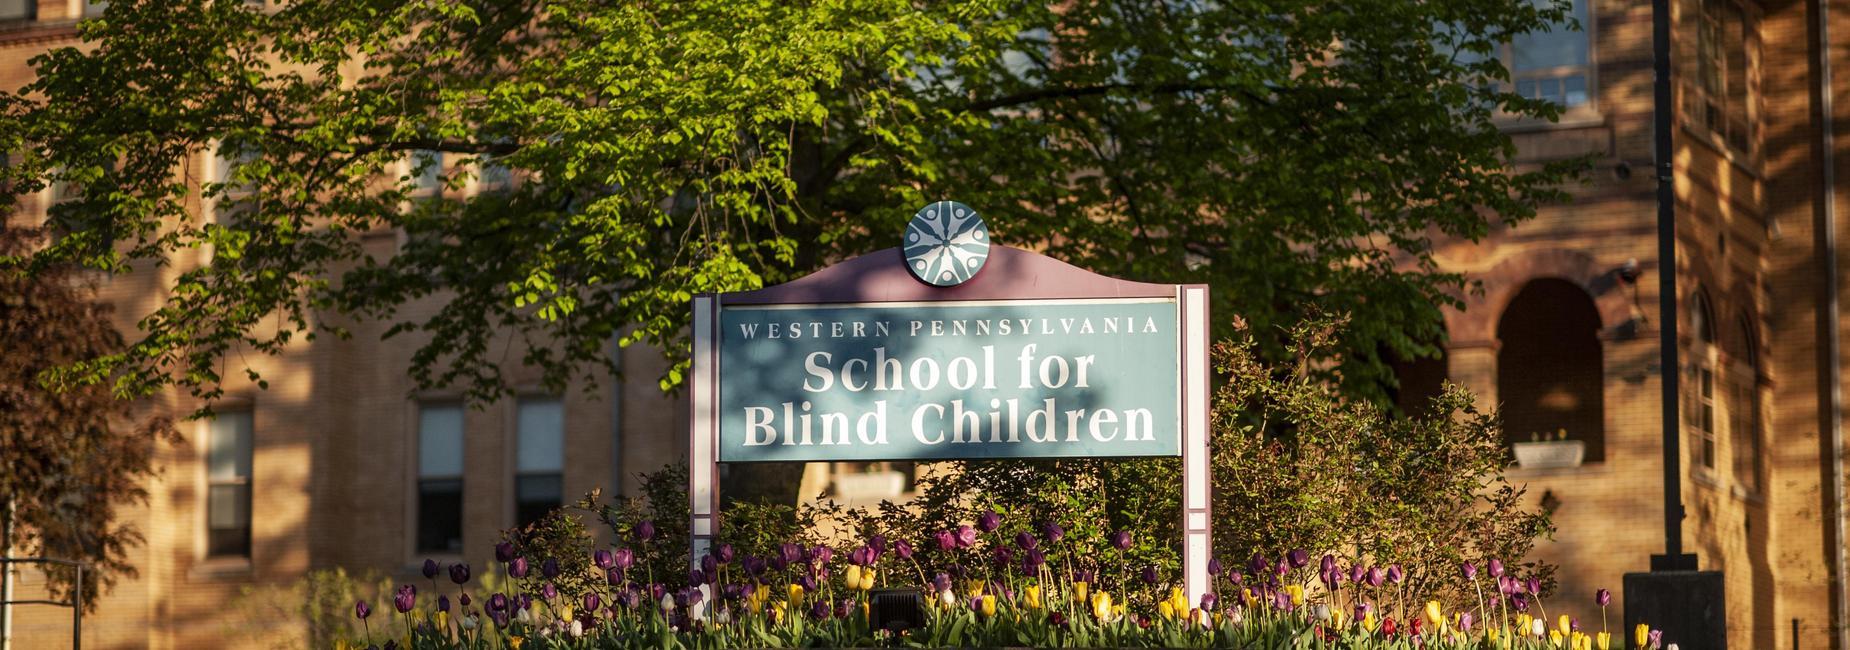 Photo of the Western Pennsylvania School for Blind Children